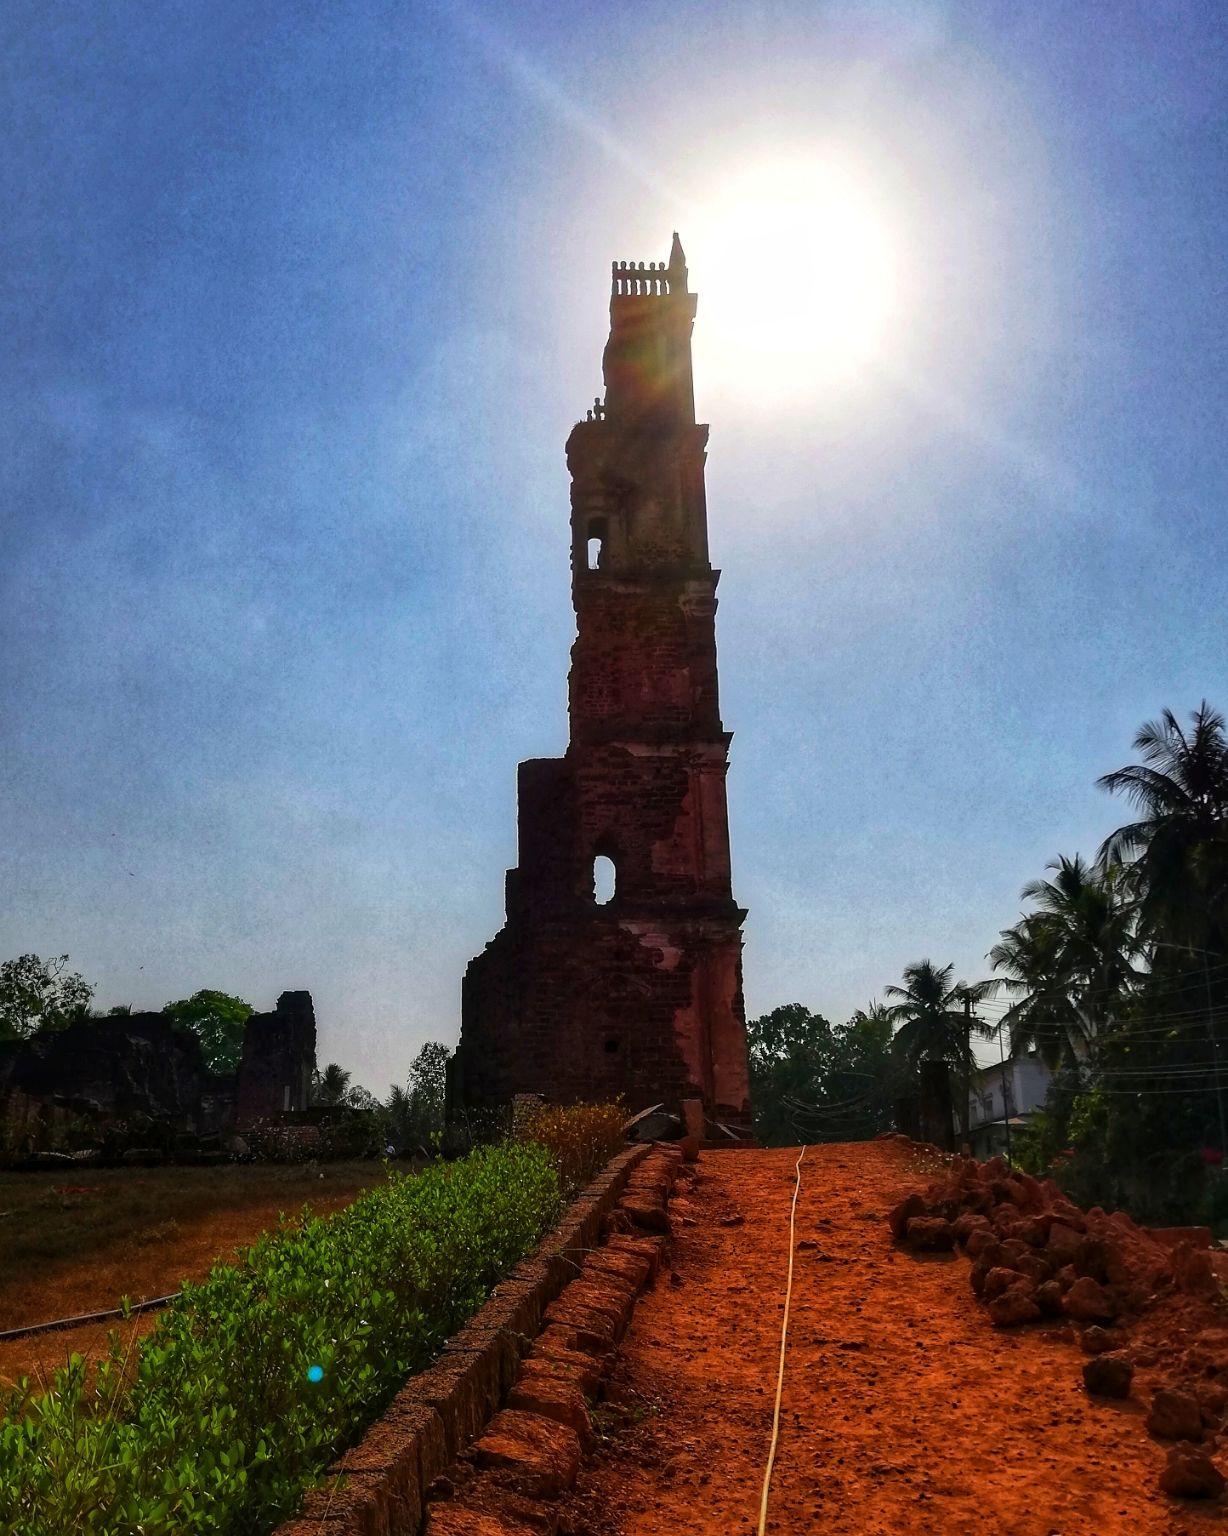 Photo of St. Augustine Tower By Alen Mariyam Thomas